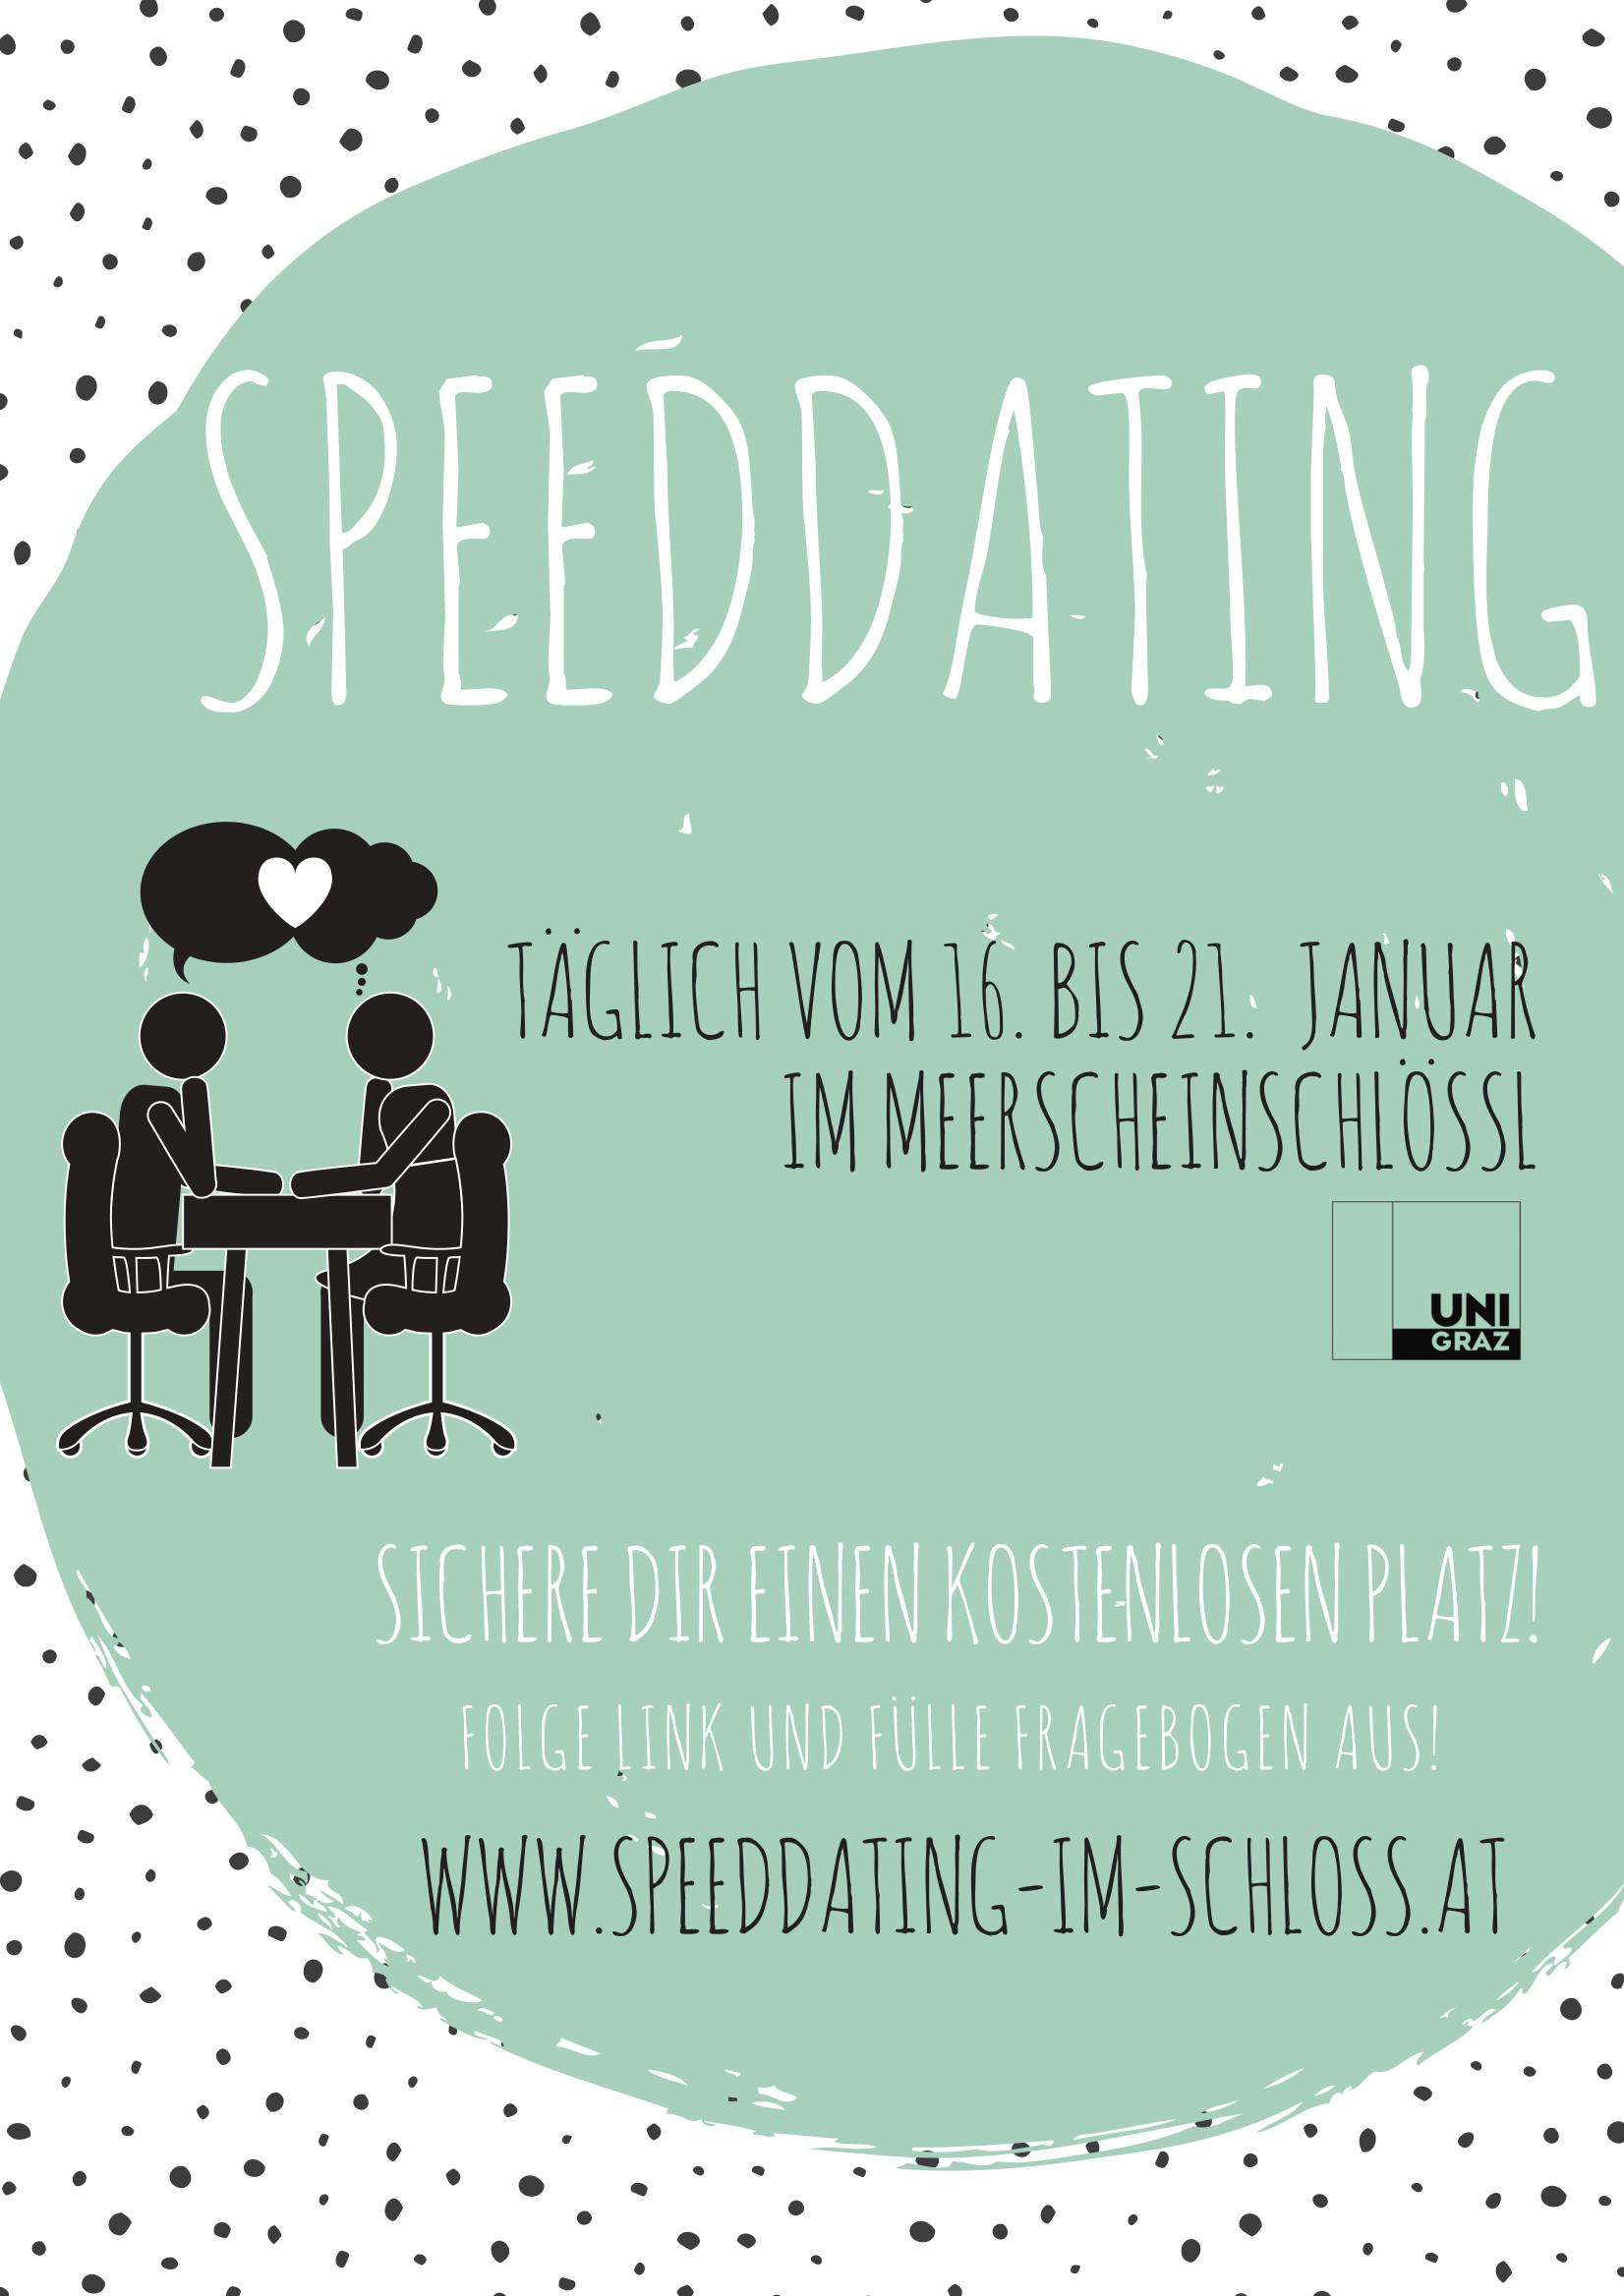 Uni graz speed dating